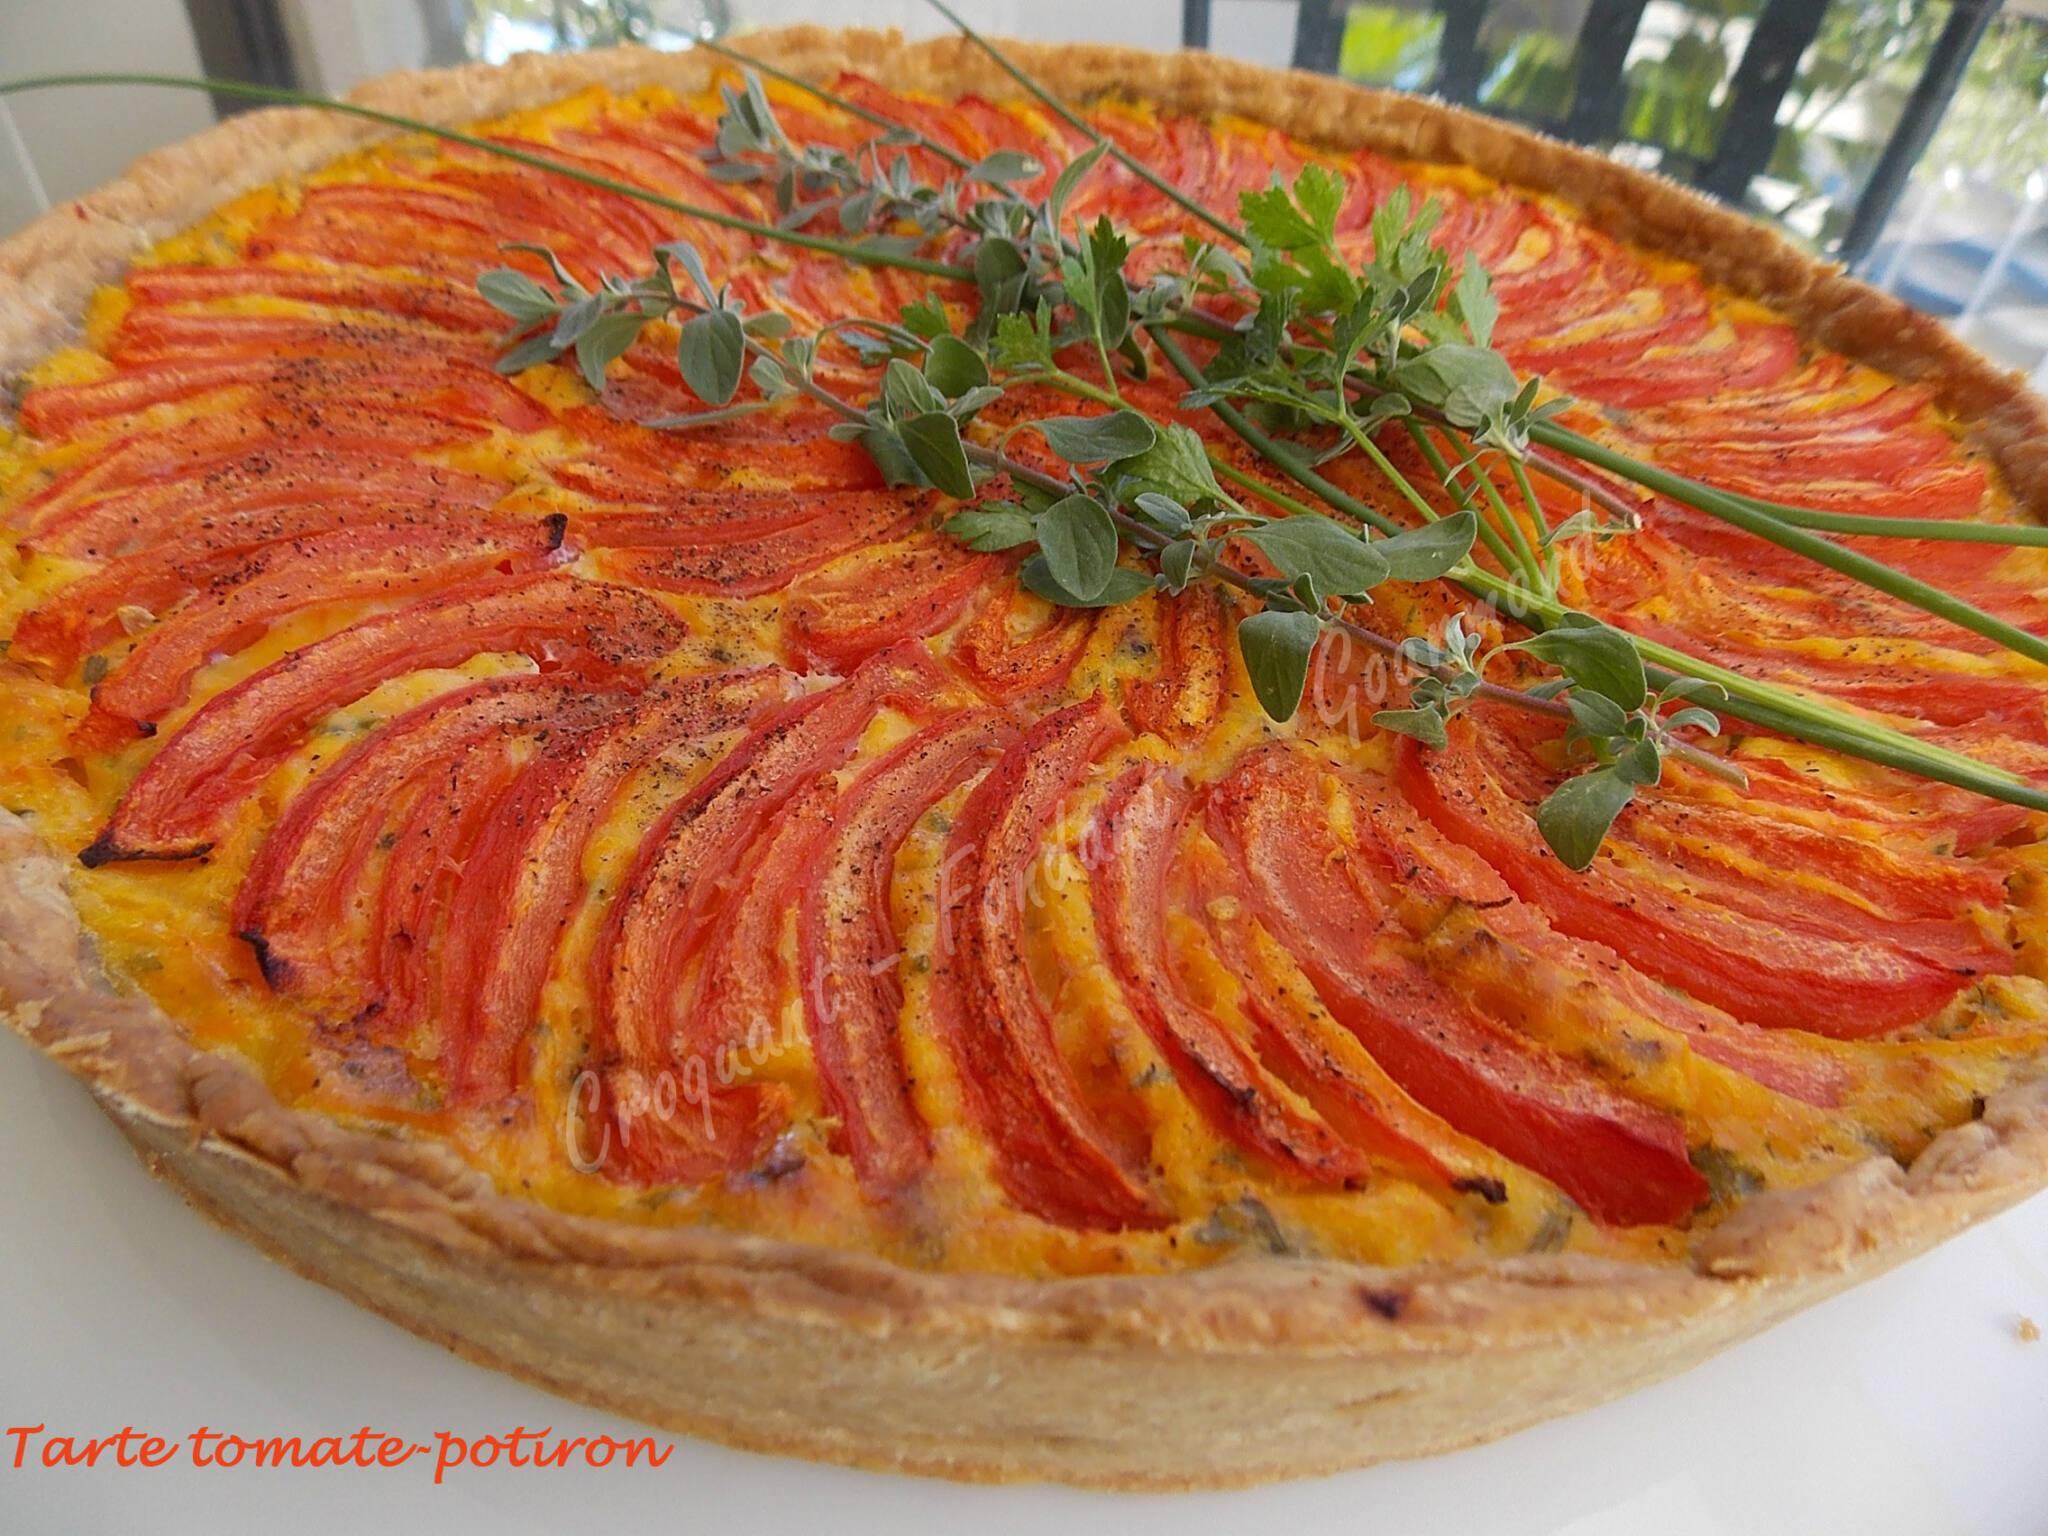 Tarte tomate-potiron DSCN0073